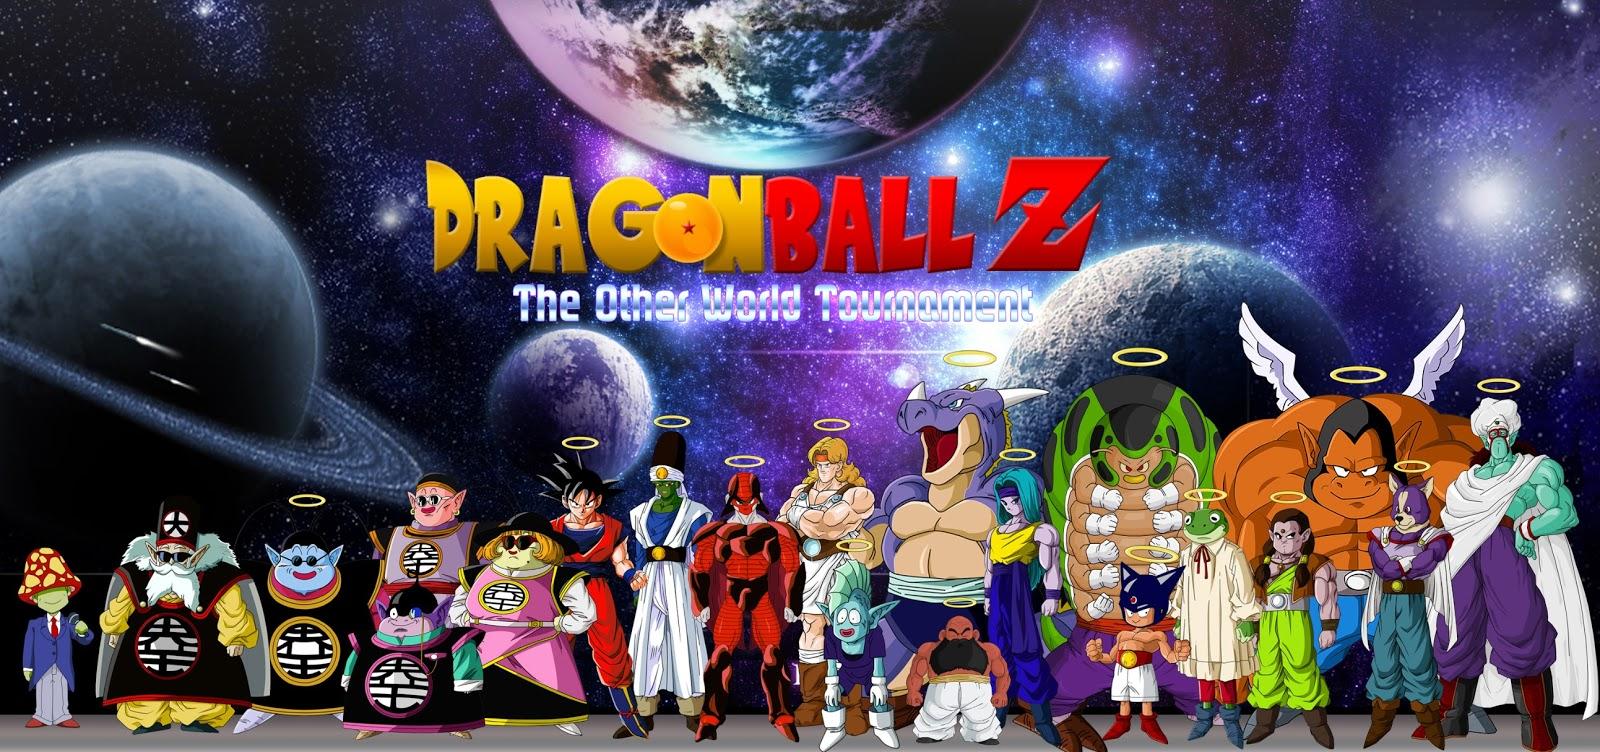 Wallpapers Hd Dragon Ball Gt Z Full Hd Wallpapers